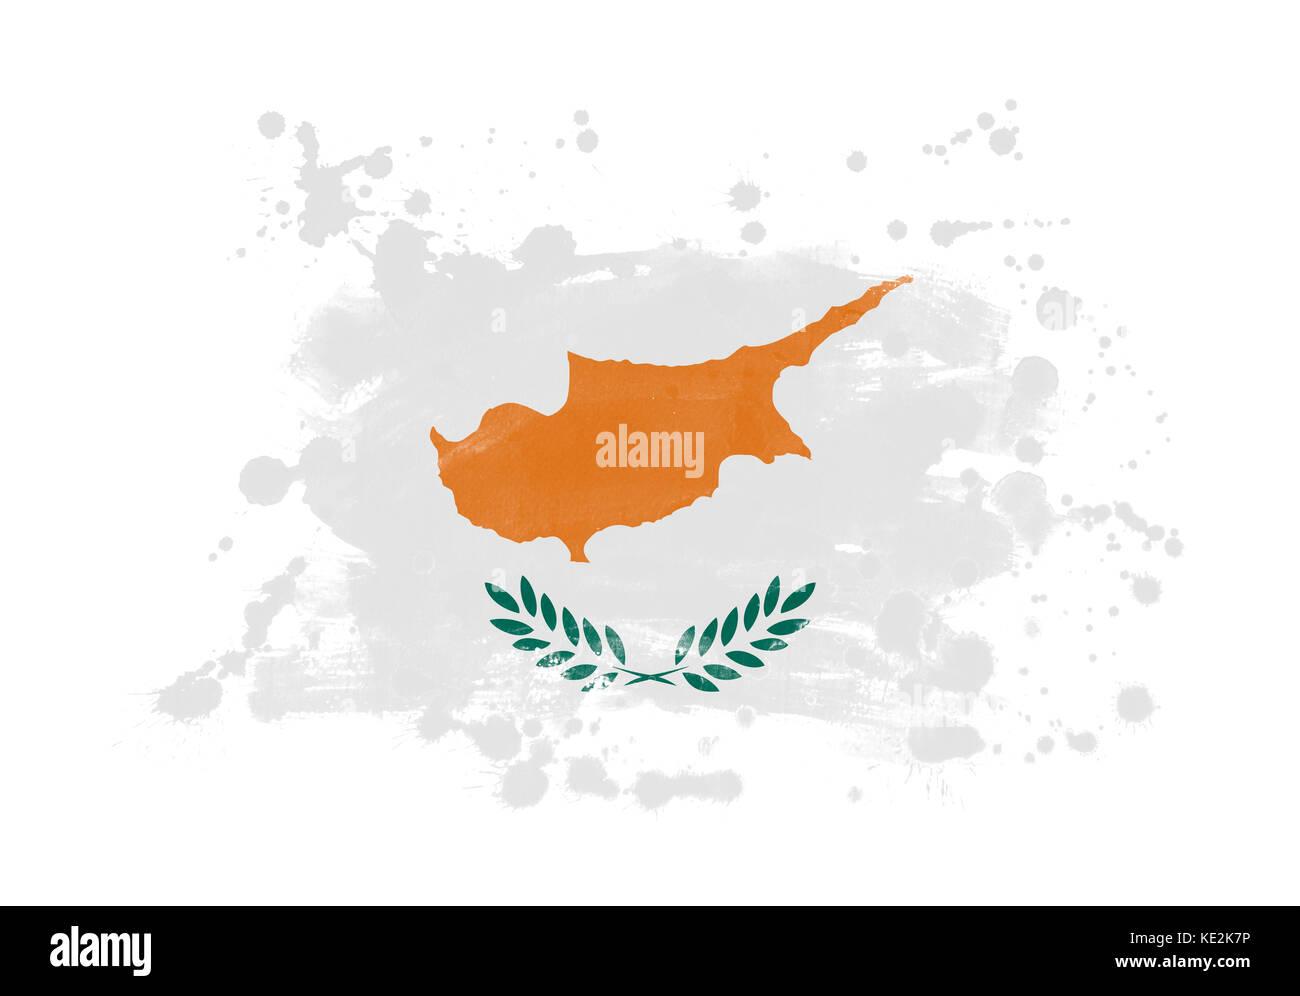 Cyprus flag grunge painted background - Stock Image